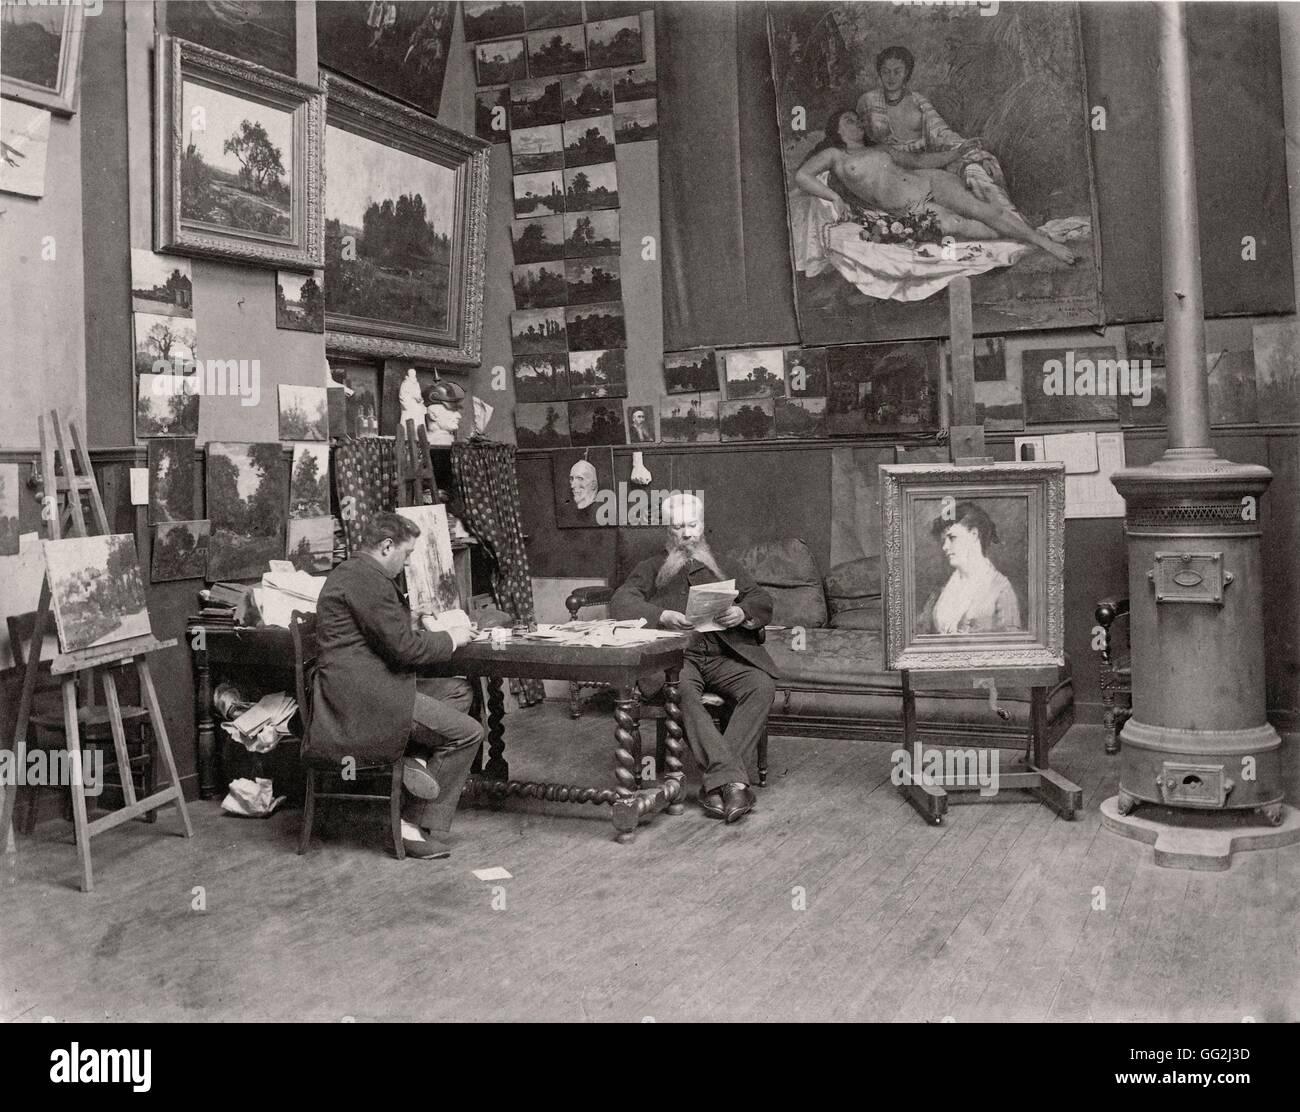 French painter Hector Hanoteau in his Paris studio. Photograph by Edmond Bénard c.1885. Albumen print. Stock Photo